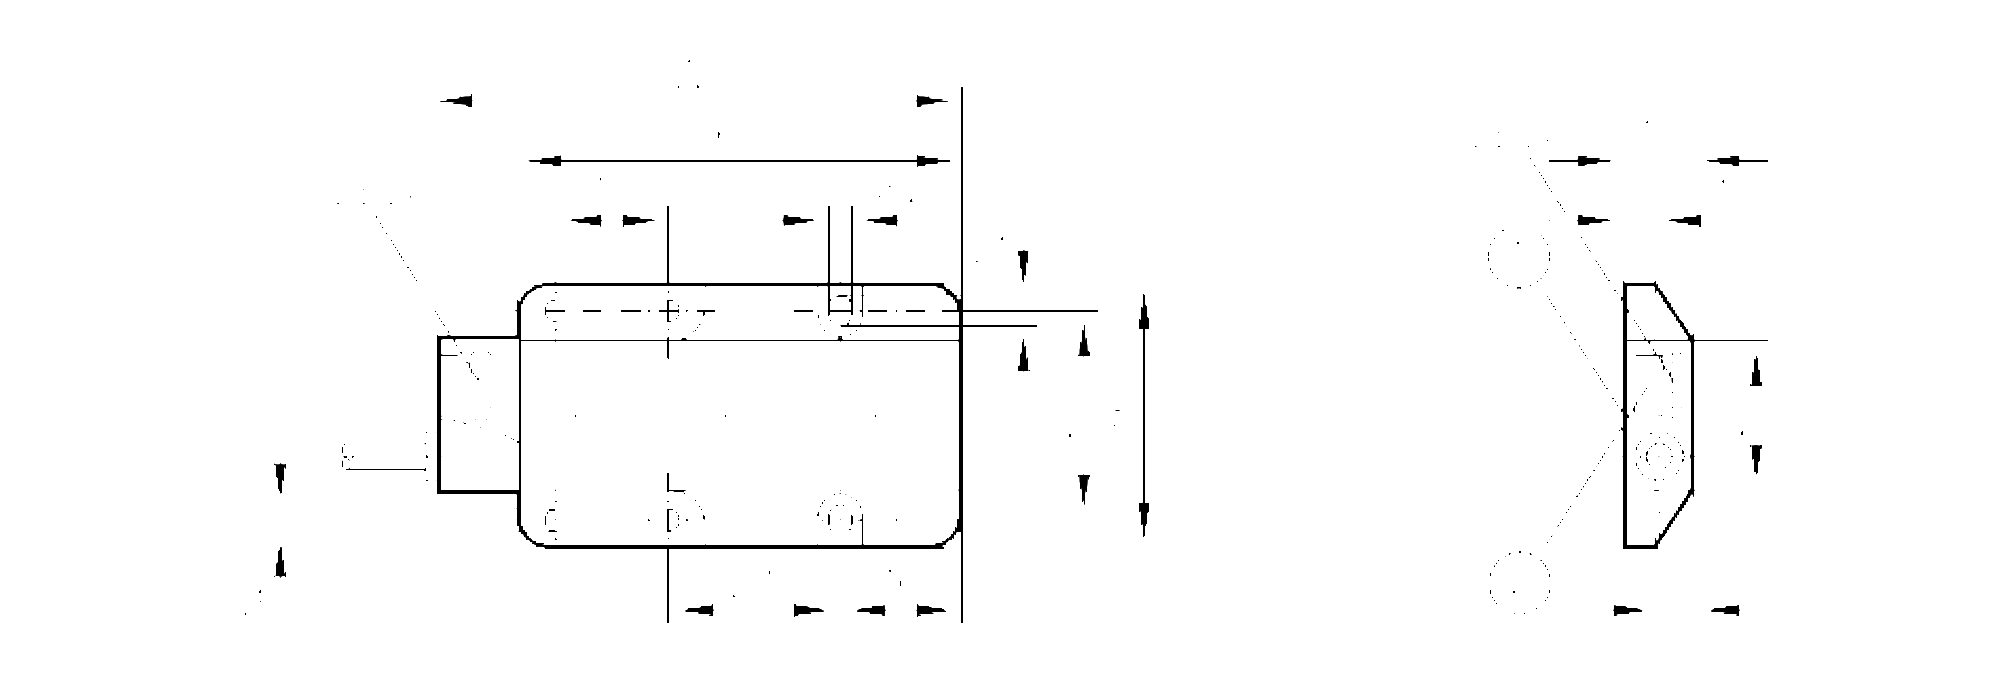 kn5105 - capacitive sensor